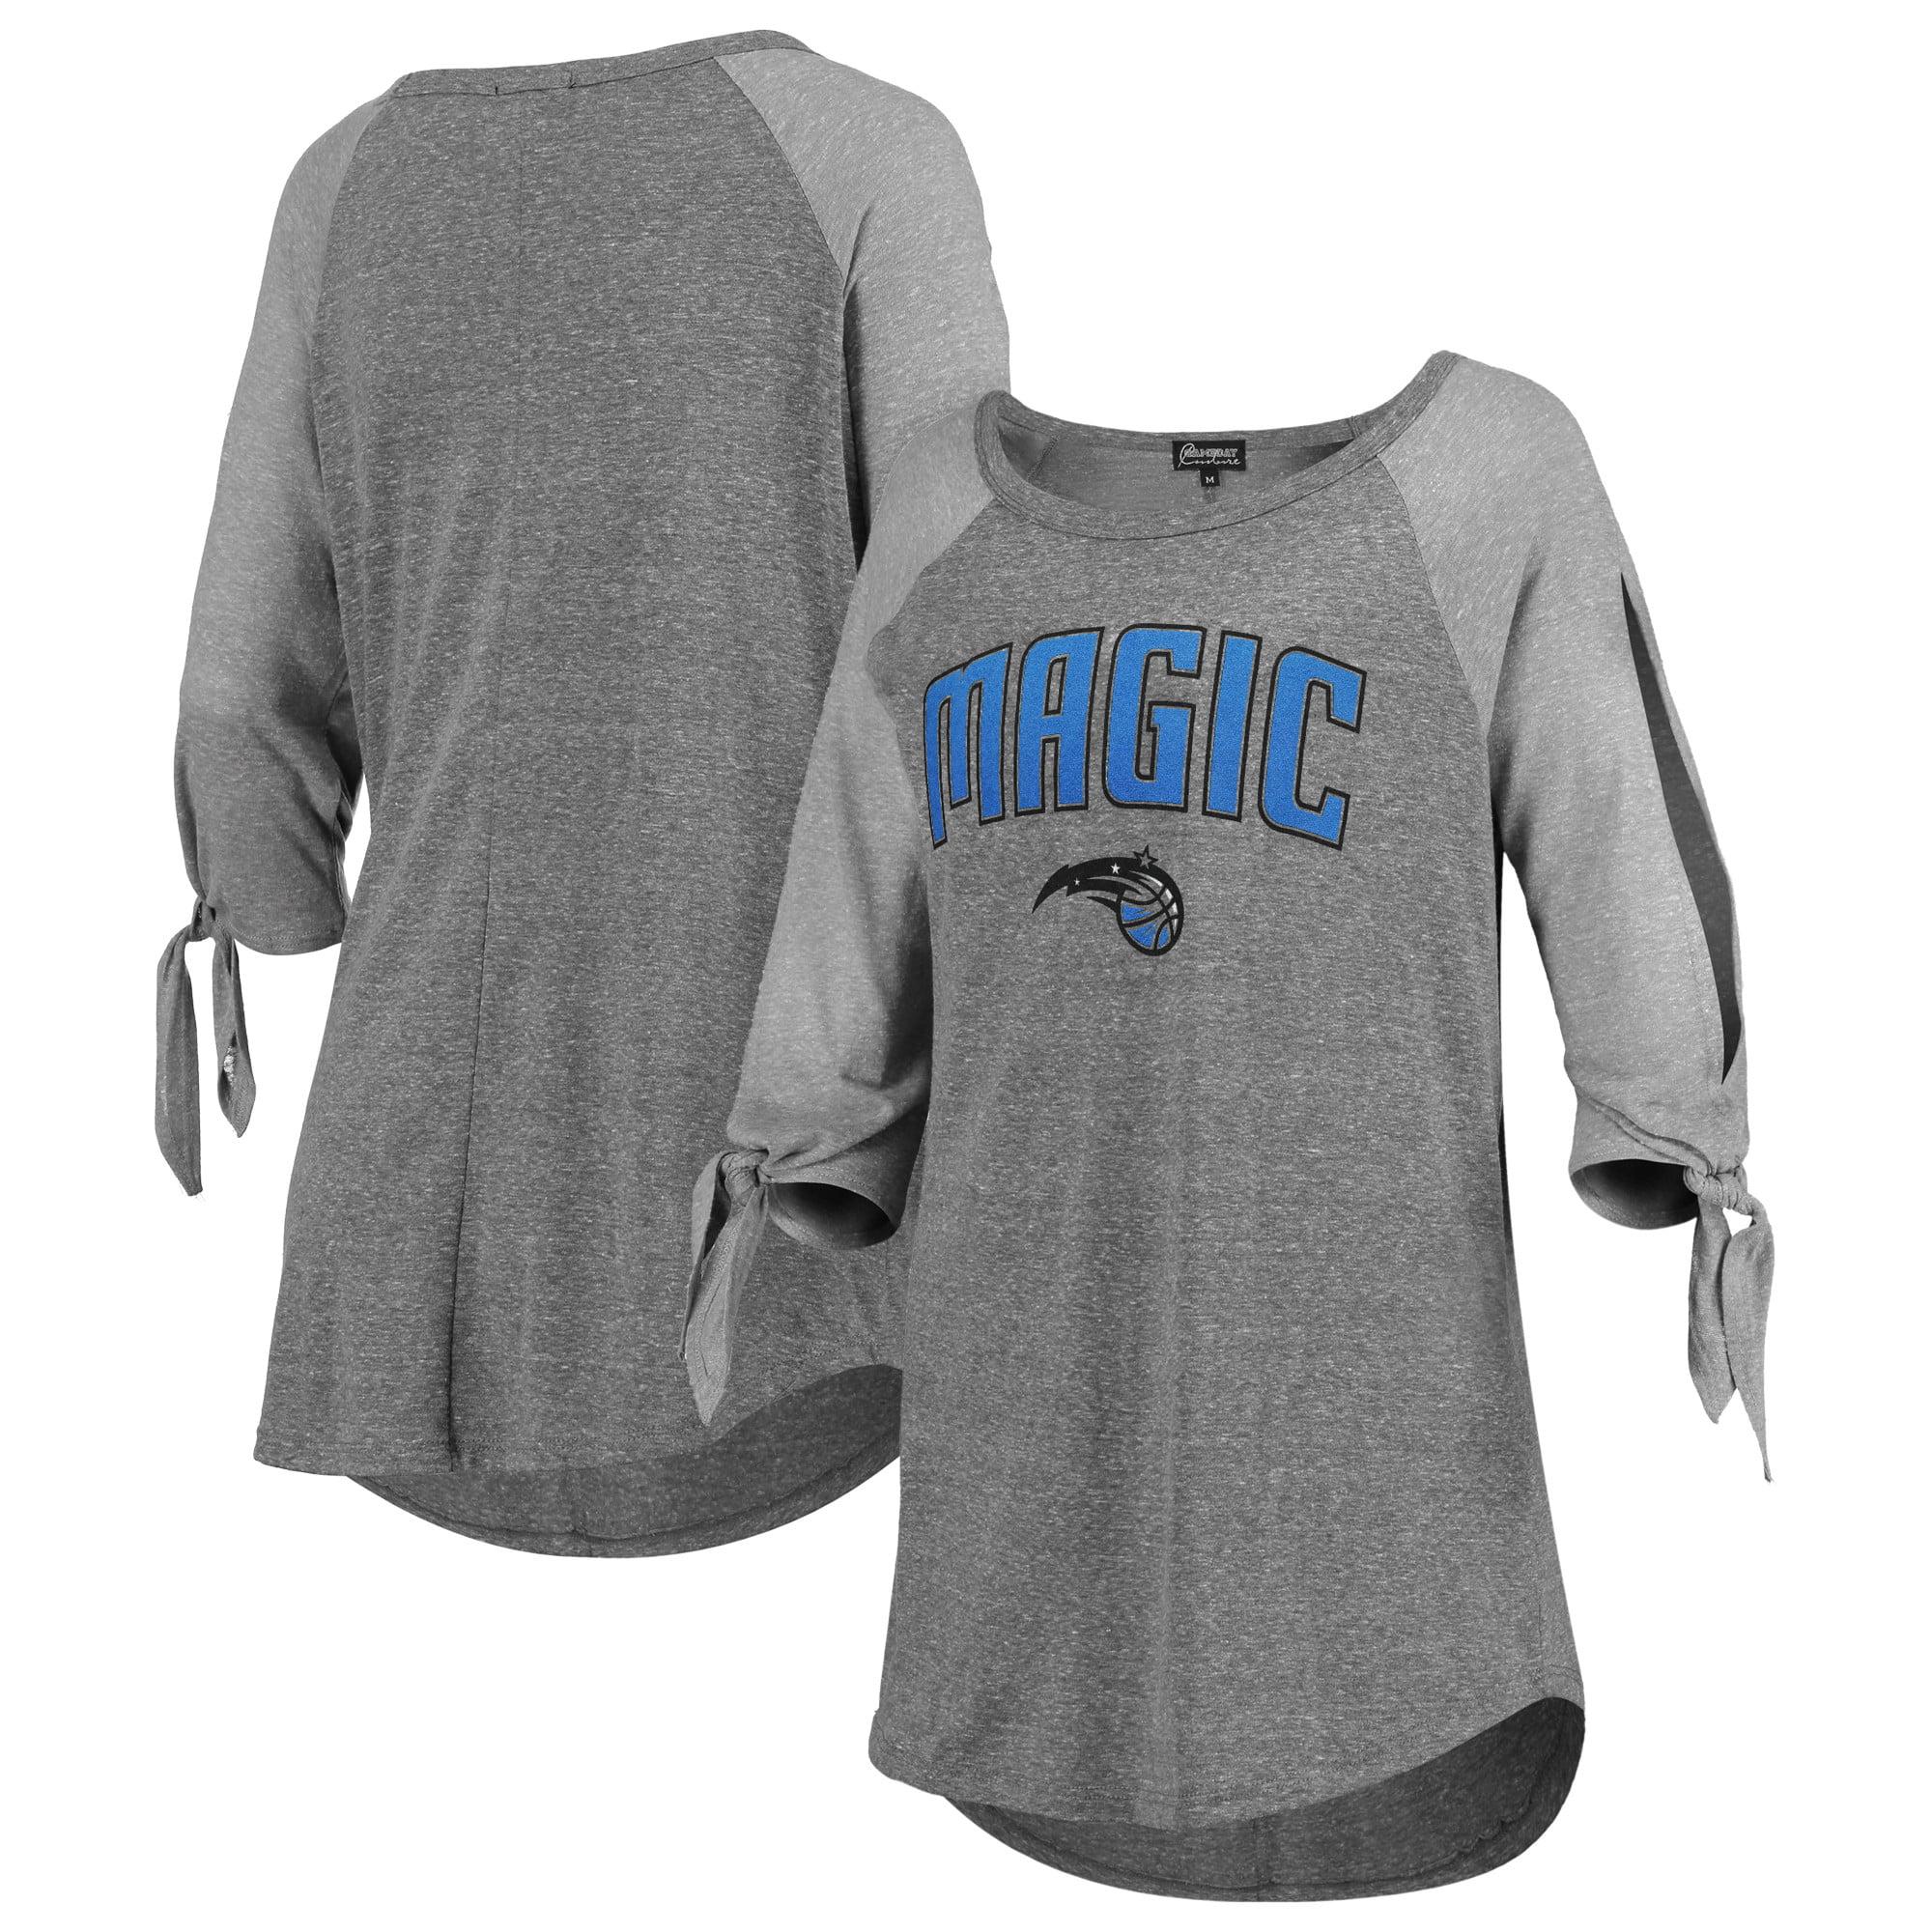 Orlando Magic Women's Open Shoulder Raglan Tri-Blend 3/4-Sleeve T-Shirt - Heathered Gray